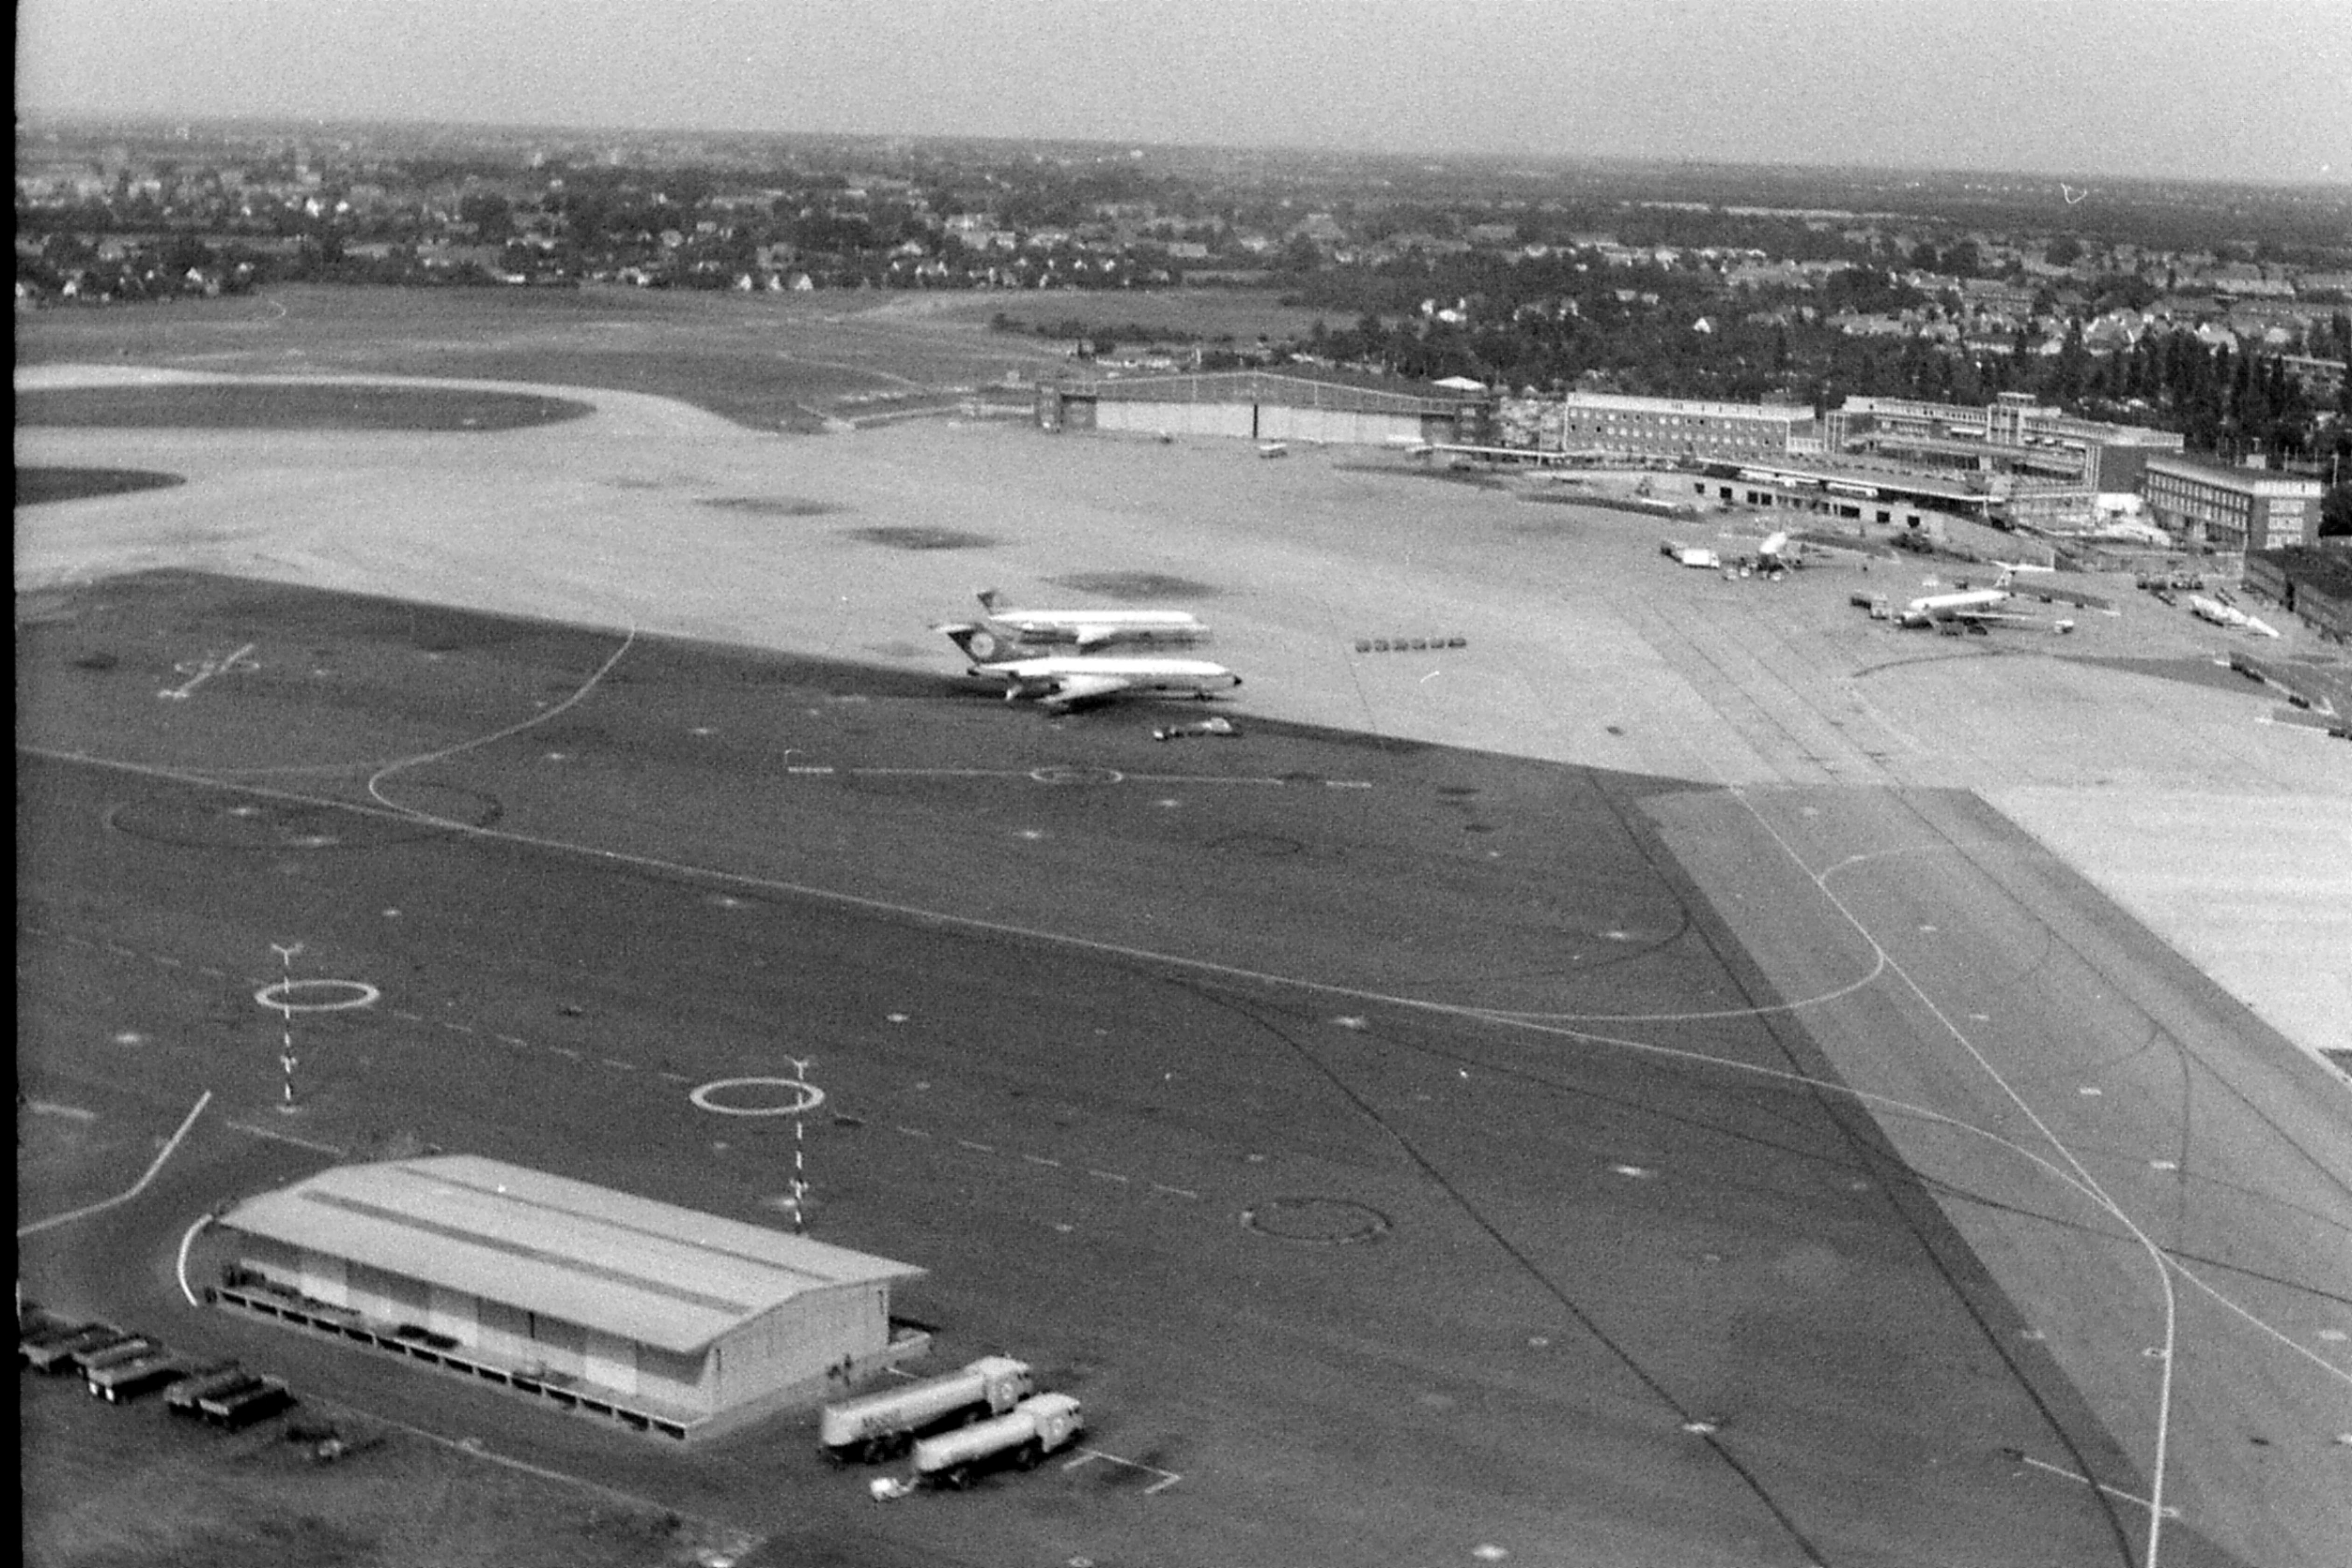 Flughafen Hamburg 1968.jpg